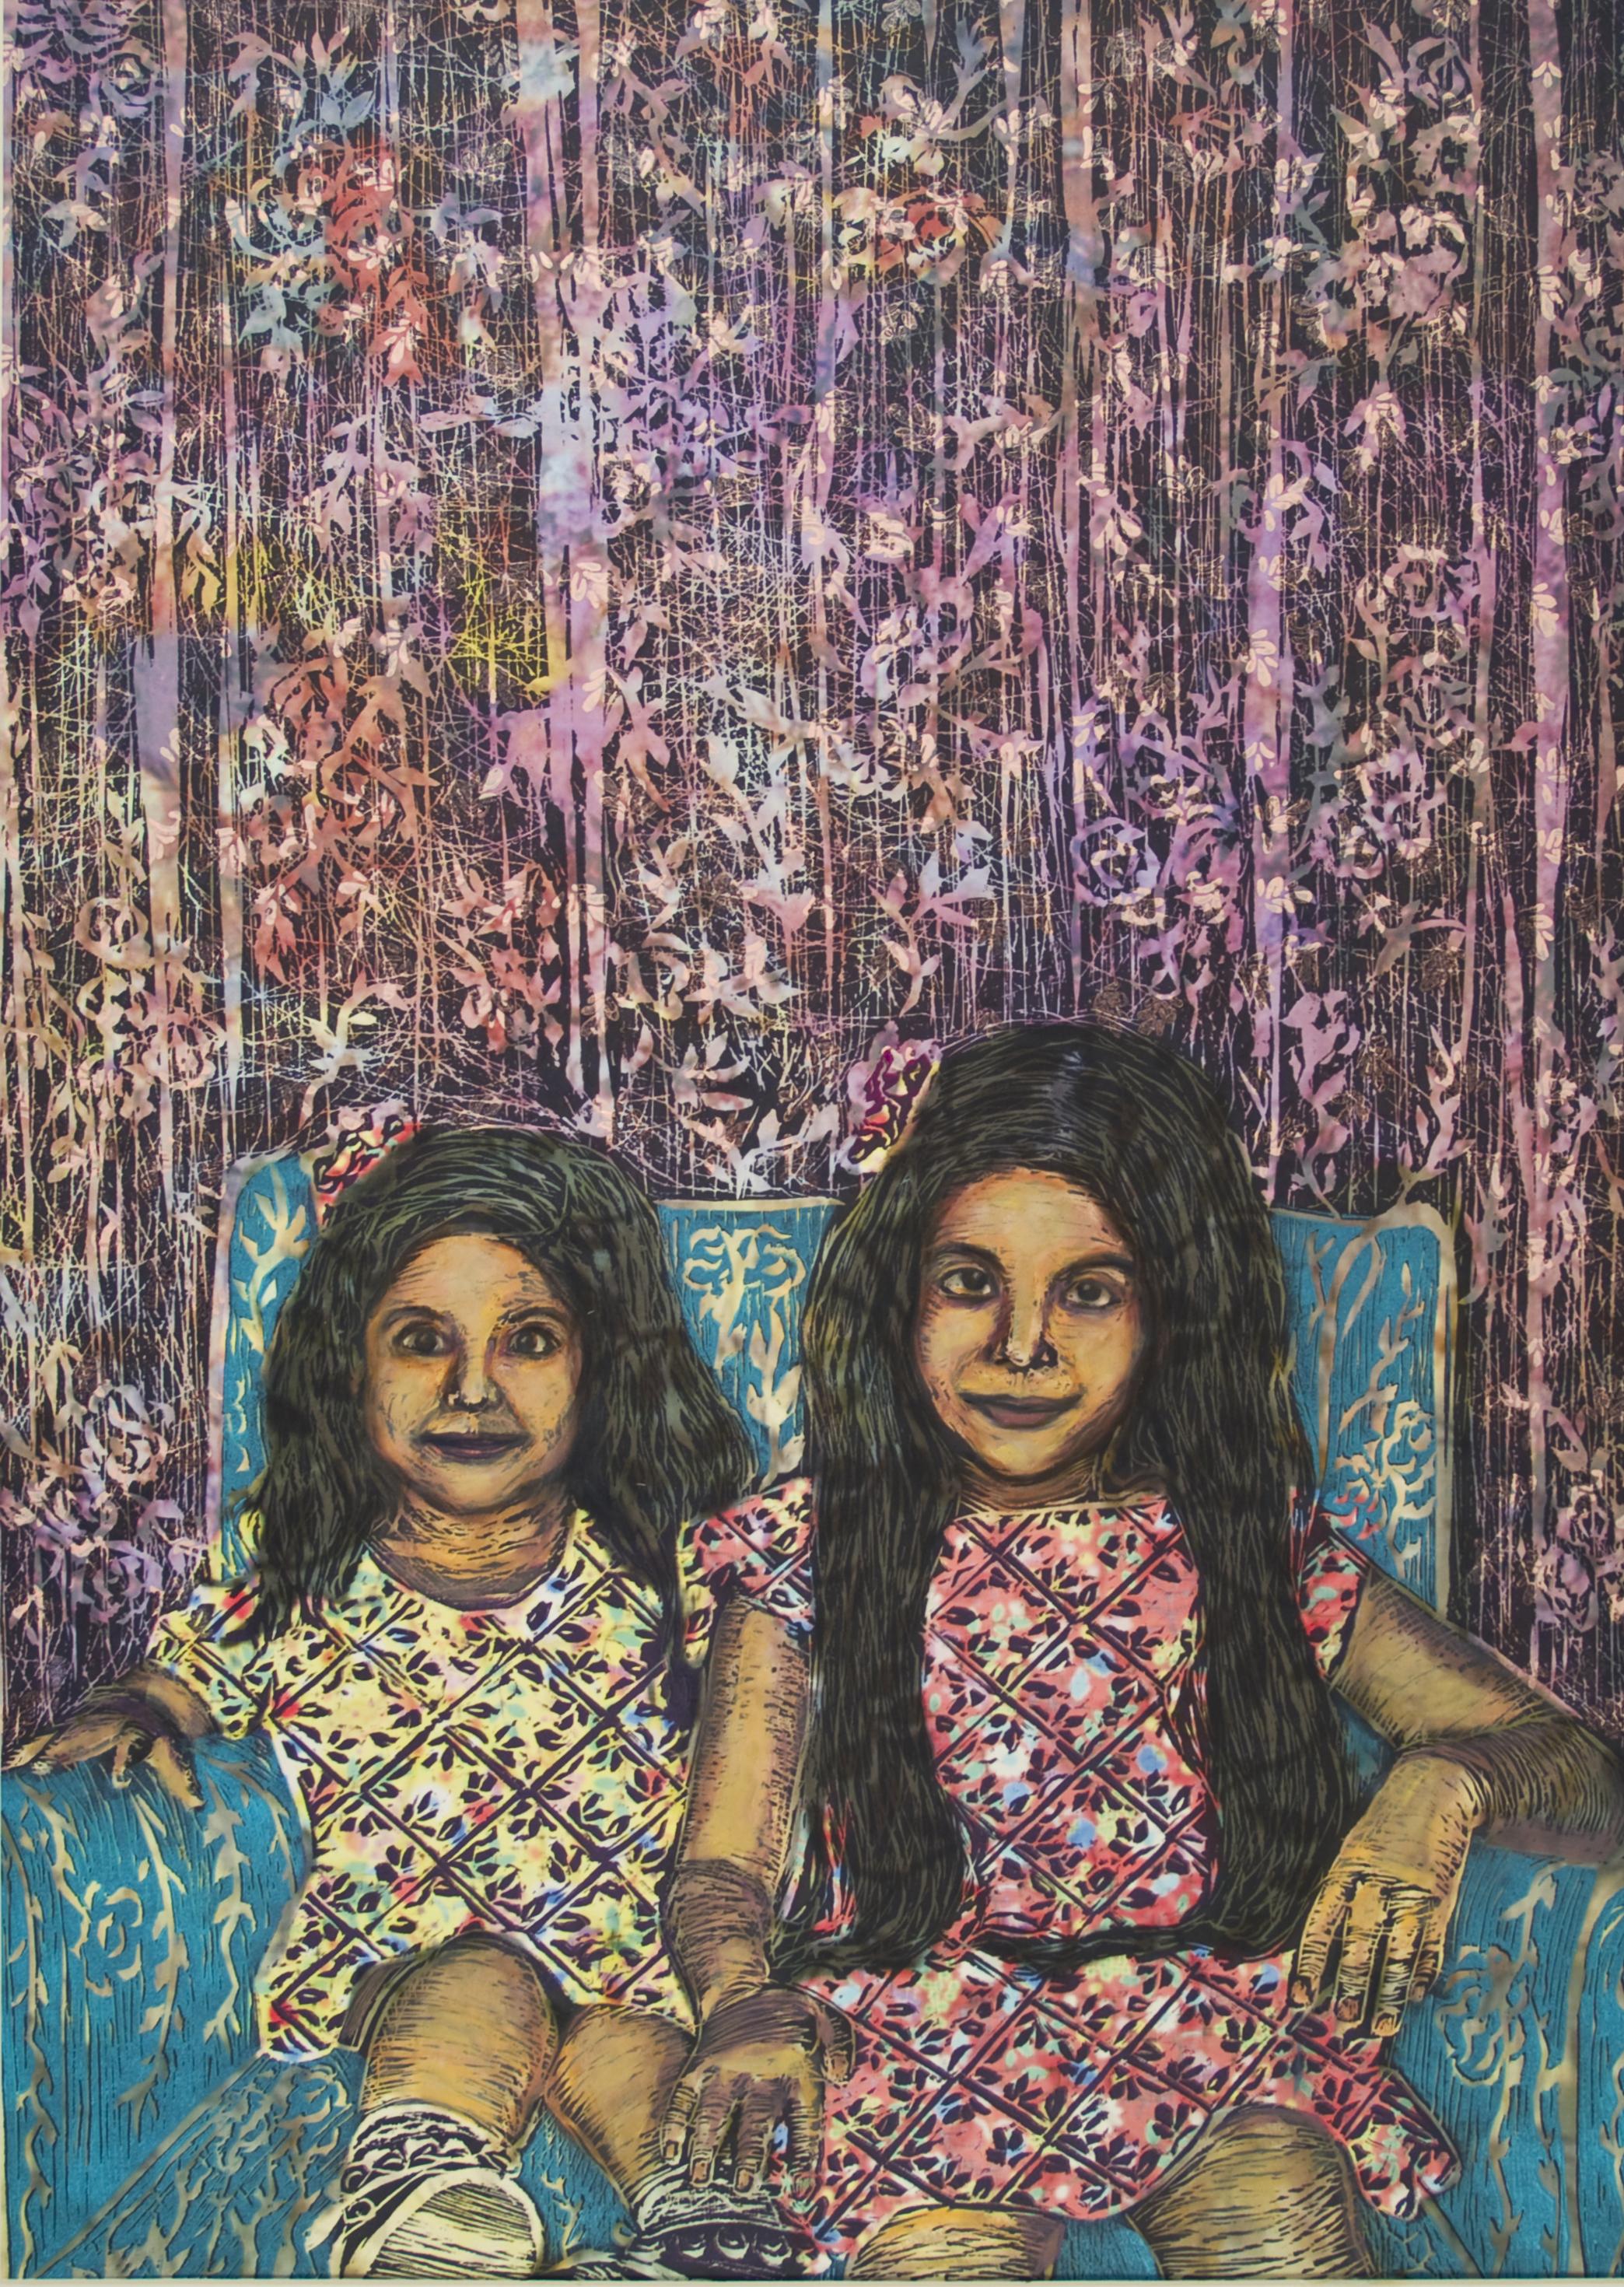 Sondra Gonzalez - Relief:Digital:Oils.jpg